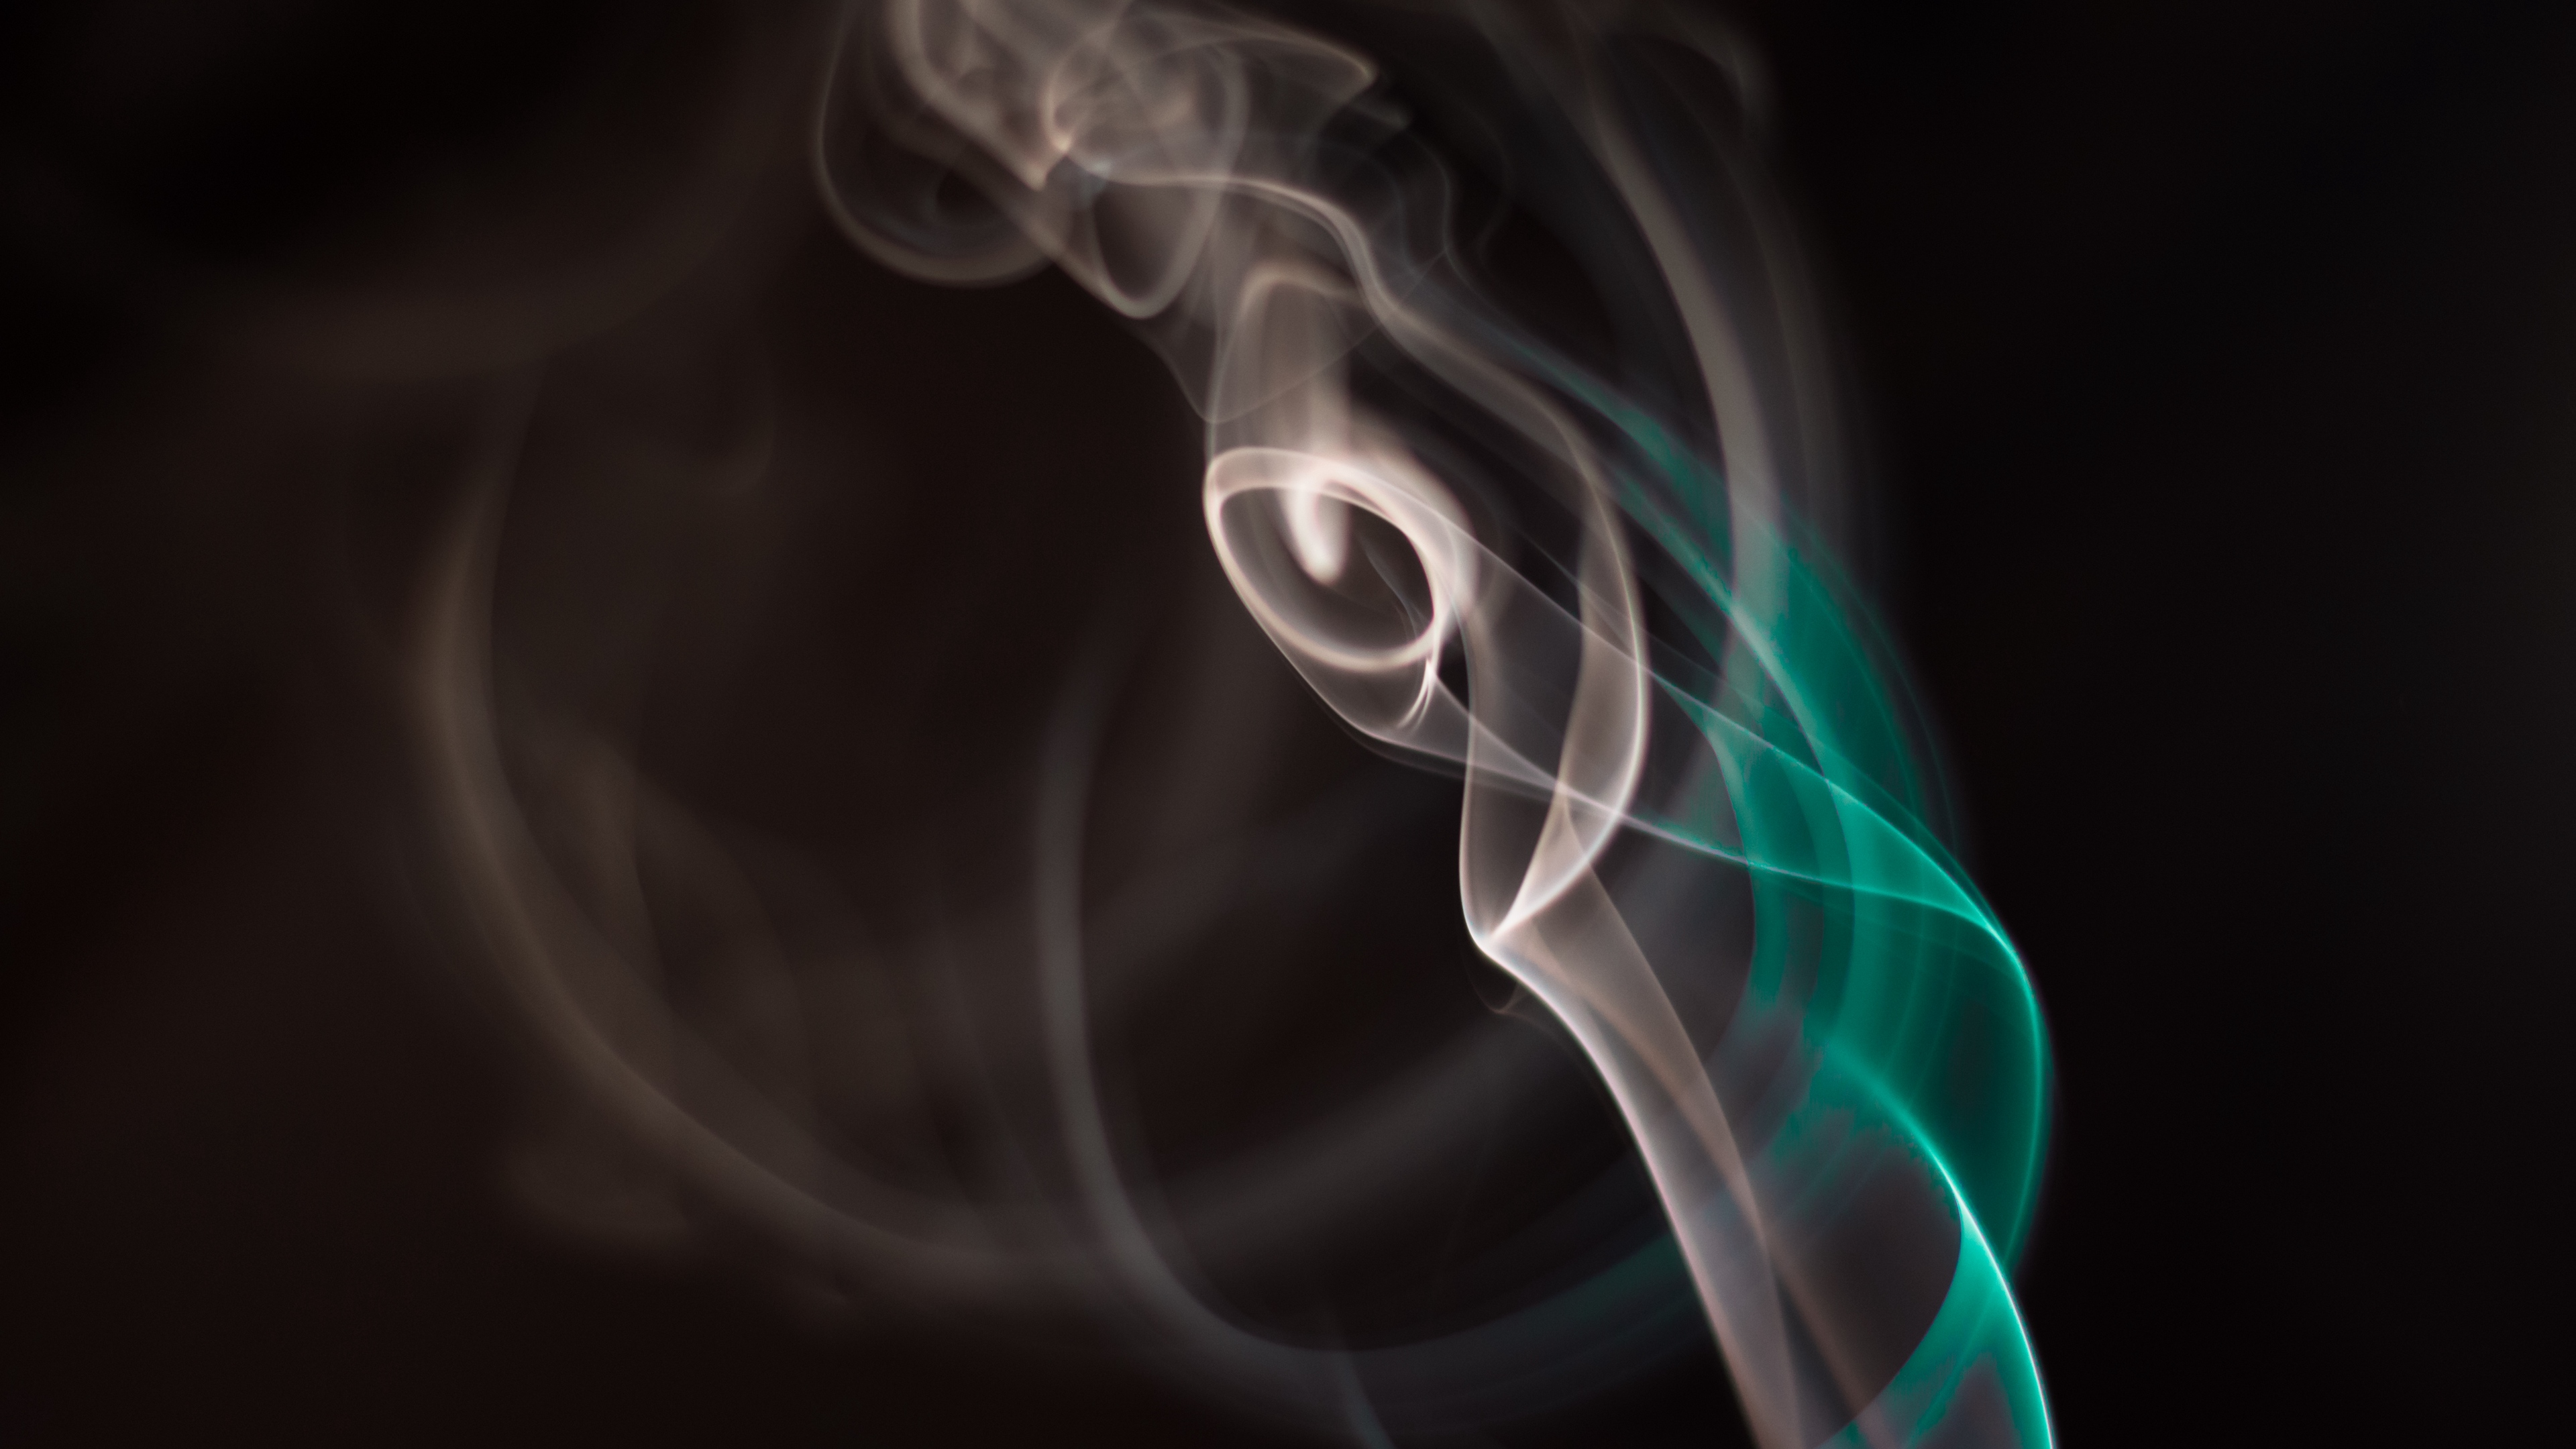 smoke colored smoke spiral swirling 4k 1539369663 - smoke, colored smoke, spiral, swirling 4k - Spiral, Smoke, colored smoke